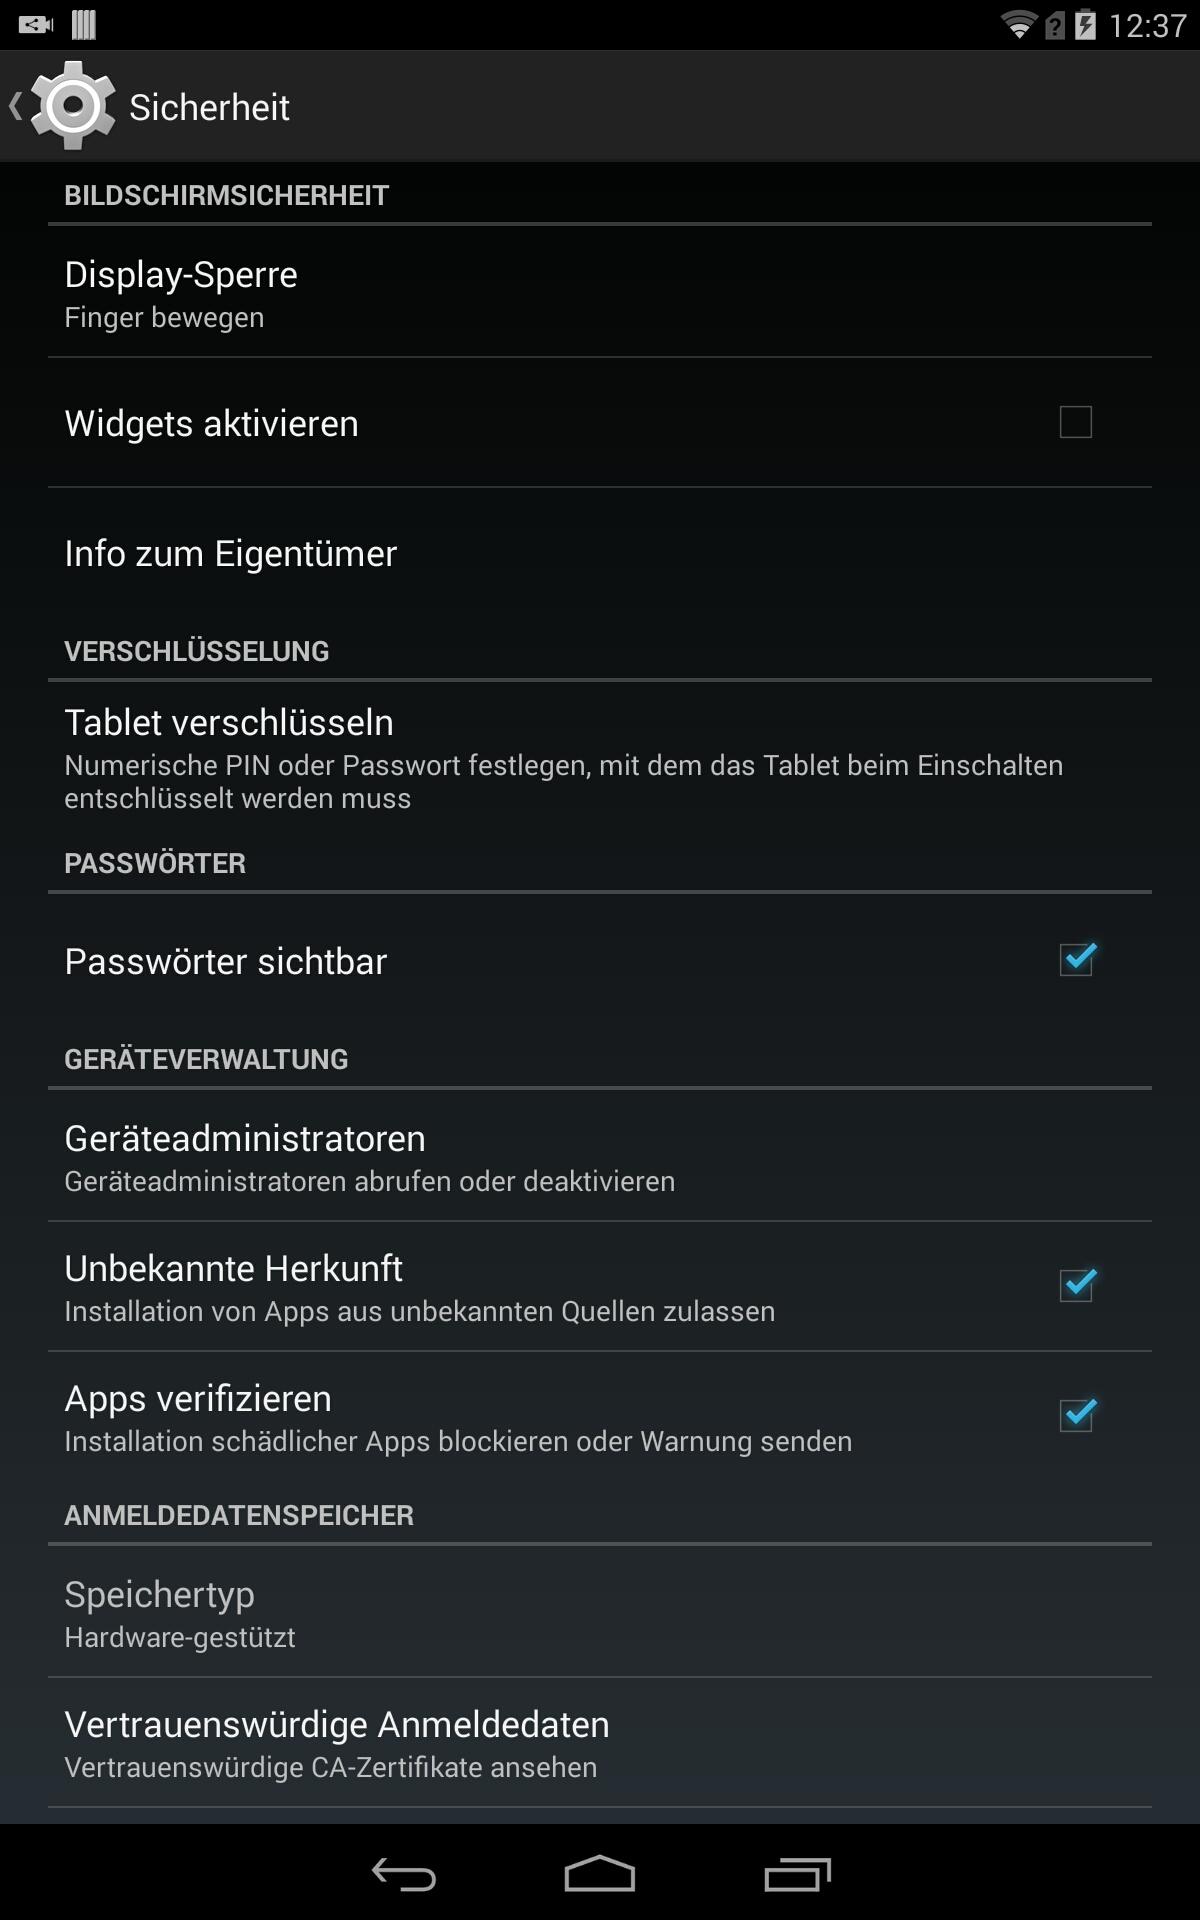 Nvidia Shield Tablet – Rooting und Chromecast Unterstützung